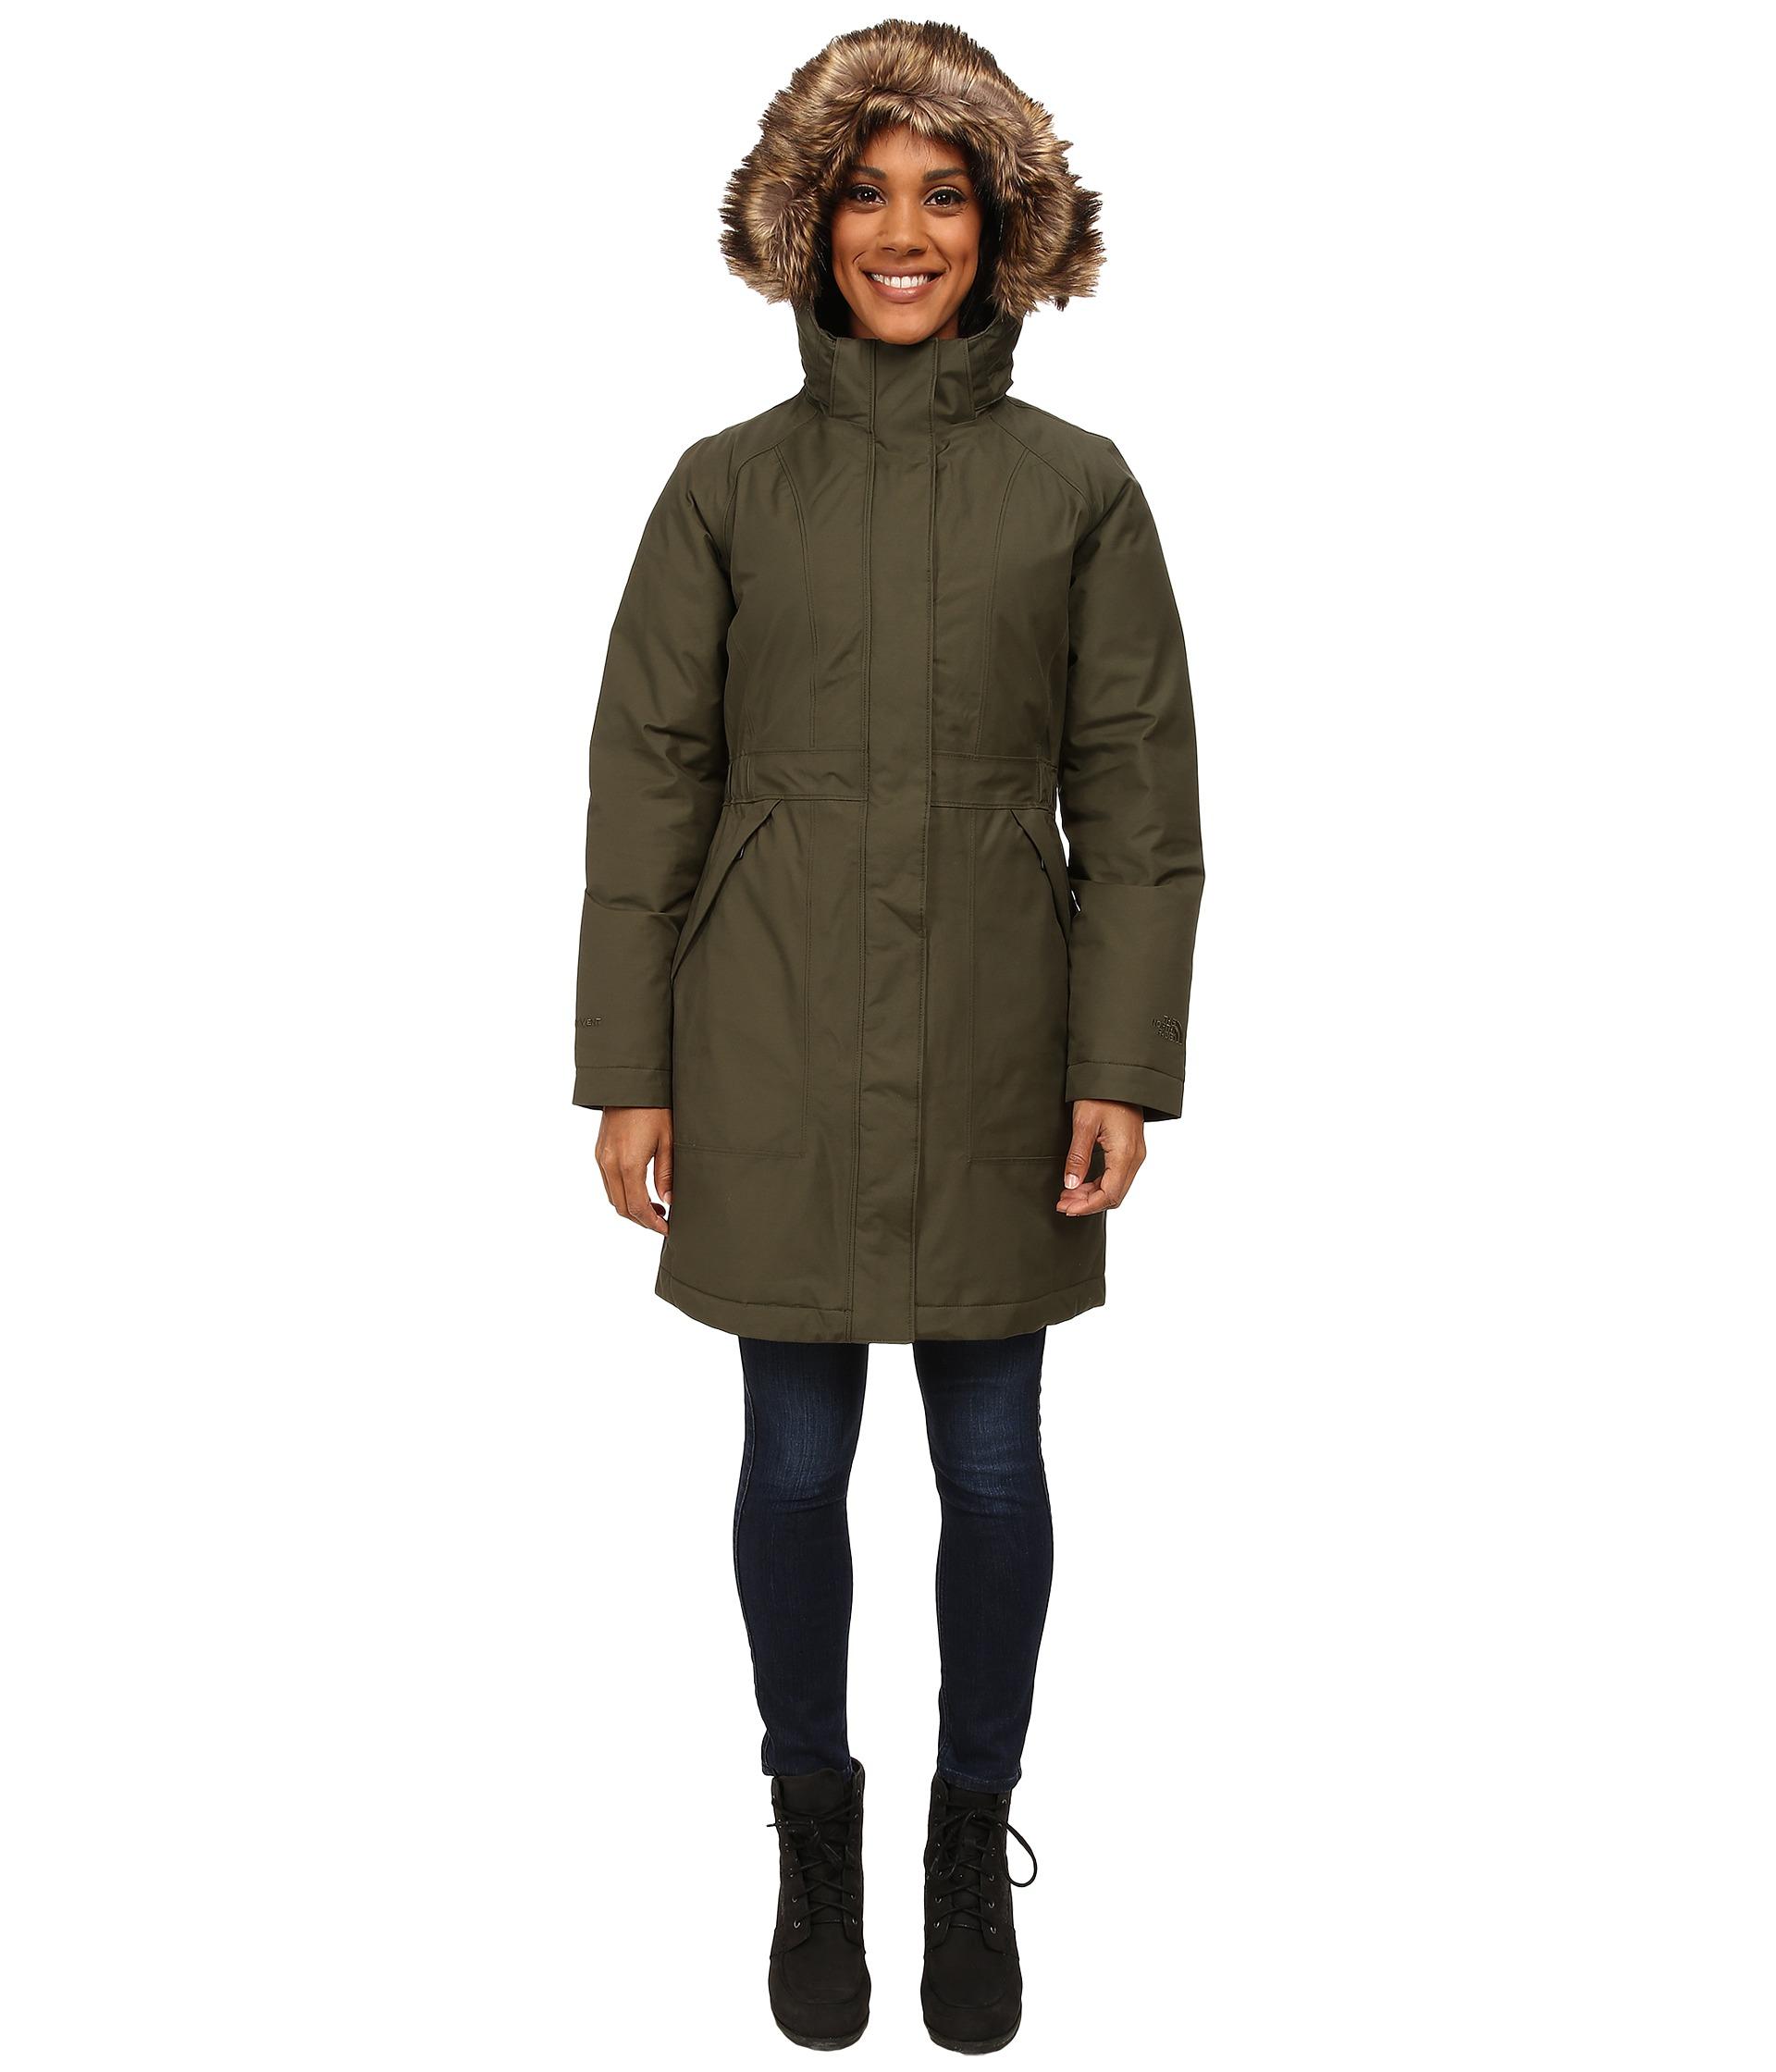 ba4514c95 north face full length womens down coat - Marwood VeneerMarwood Veneer